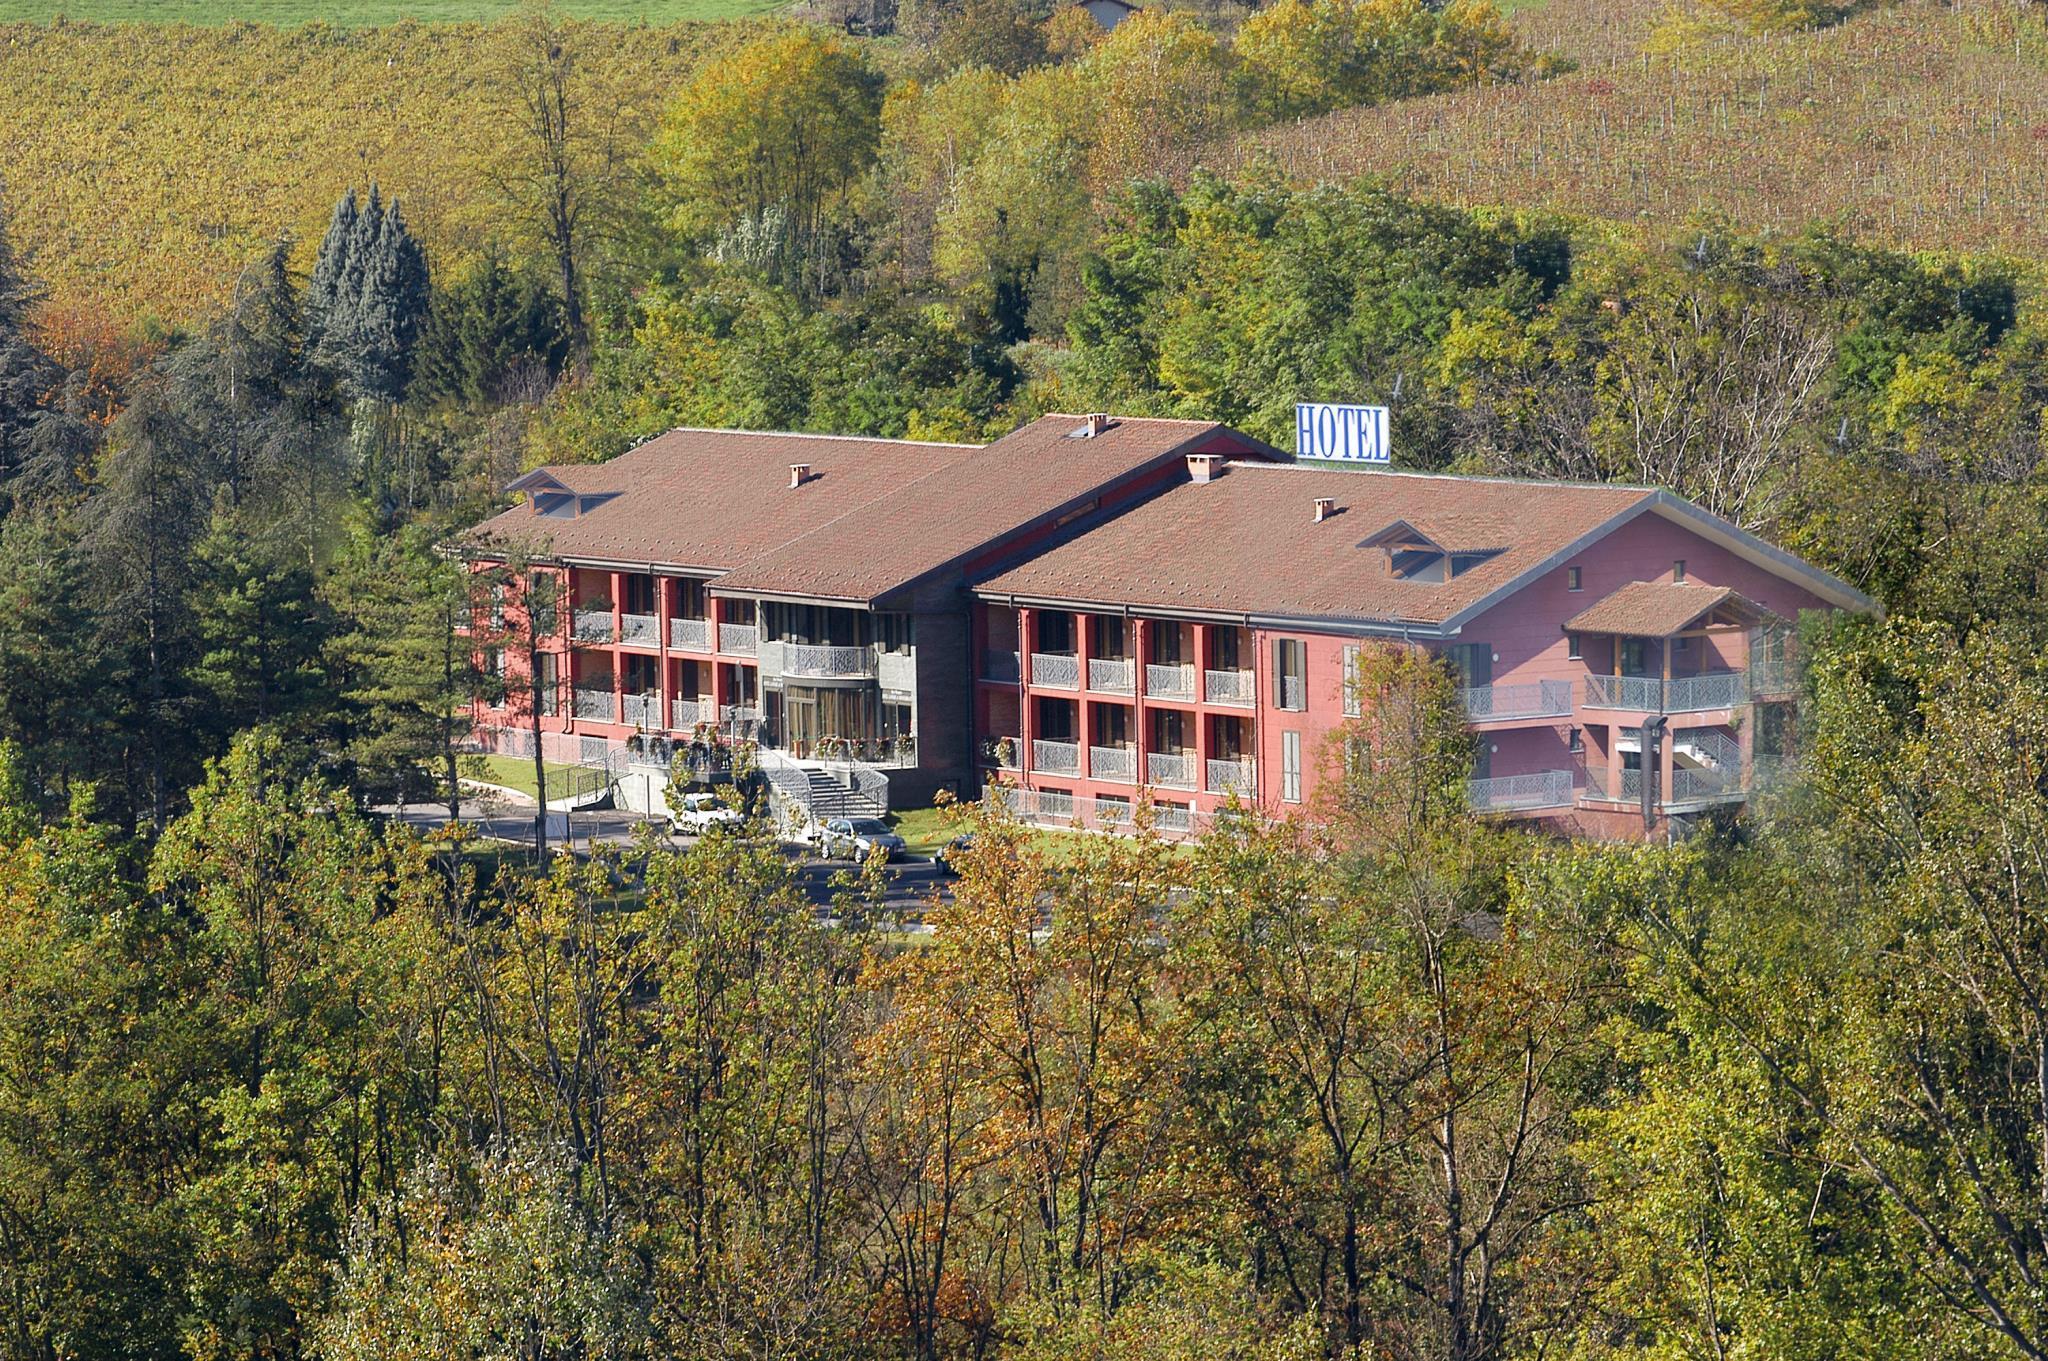 Hotel Langhe And Monferrato